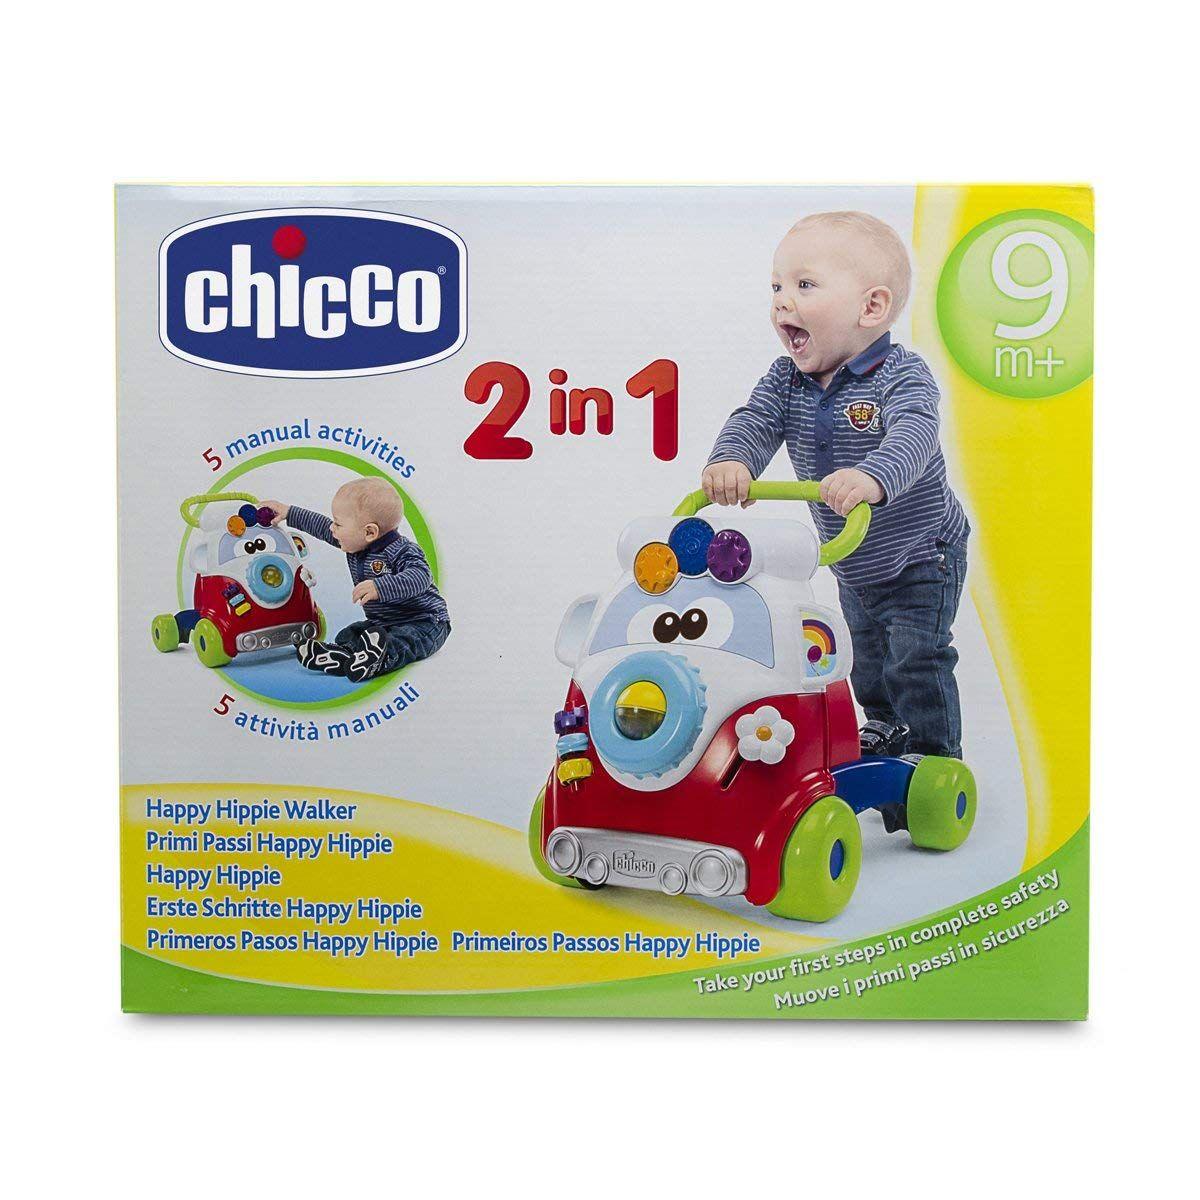 CHICCO HAPPY HIPPY WALKER